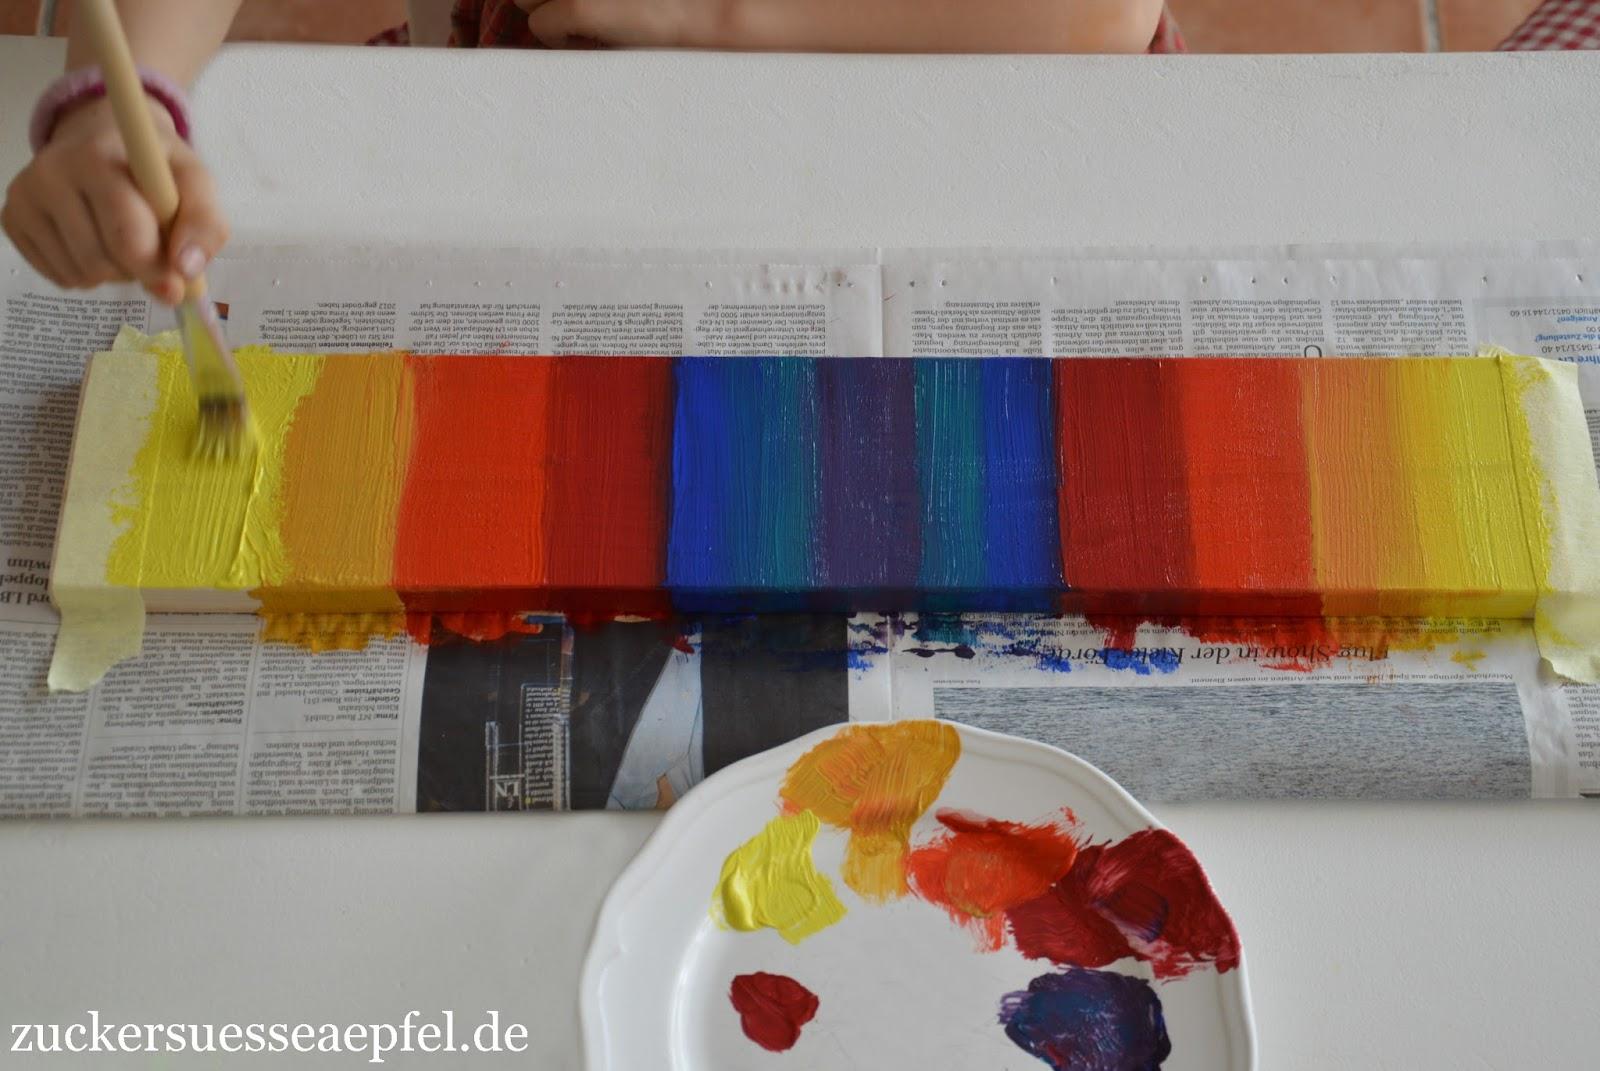 ♥ Zuckersüße Äpfel - kreativer Familienblog ♥: Eine Garderobe in ...